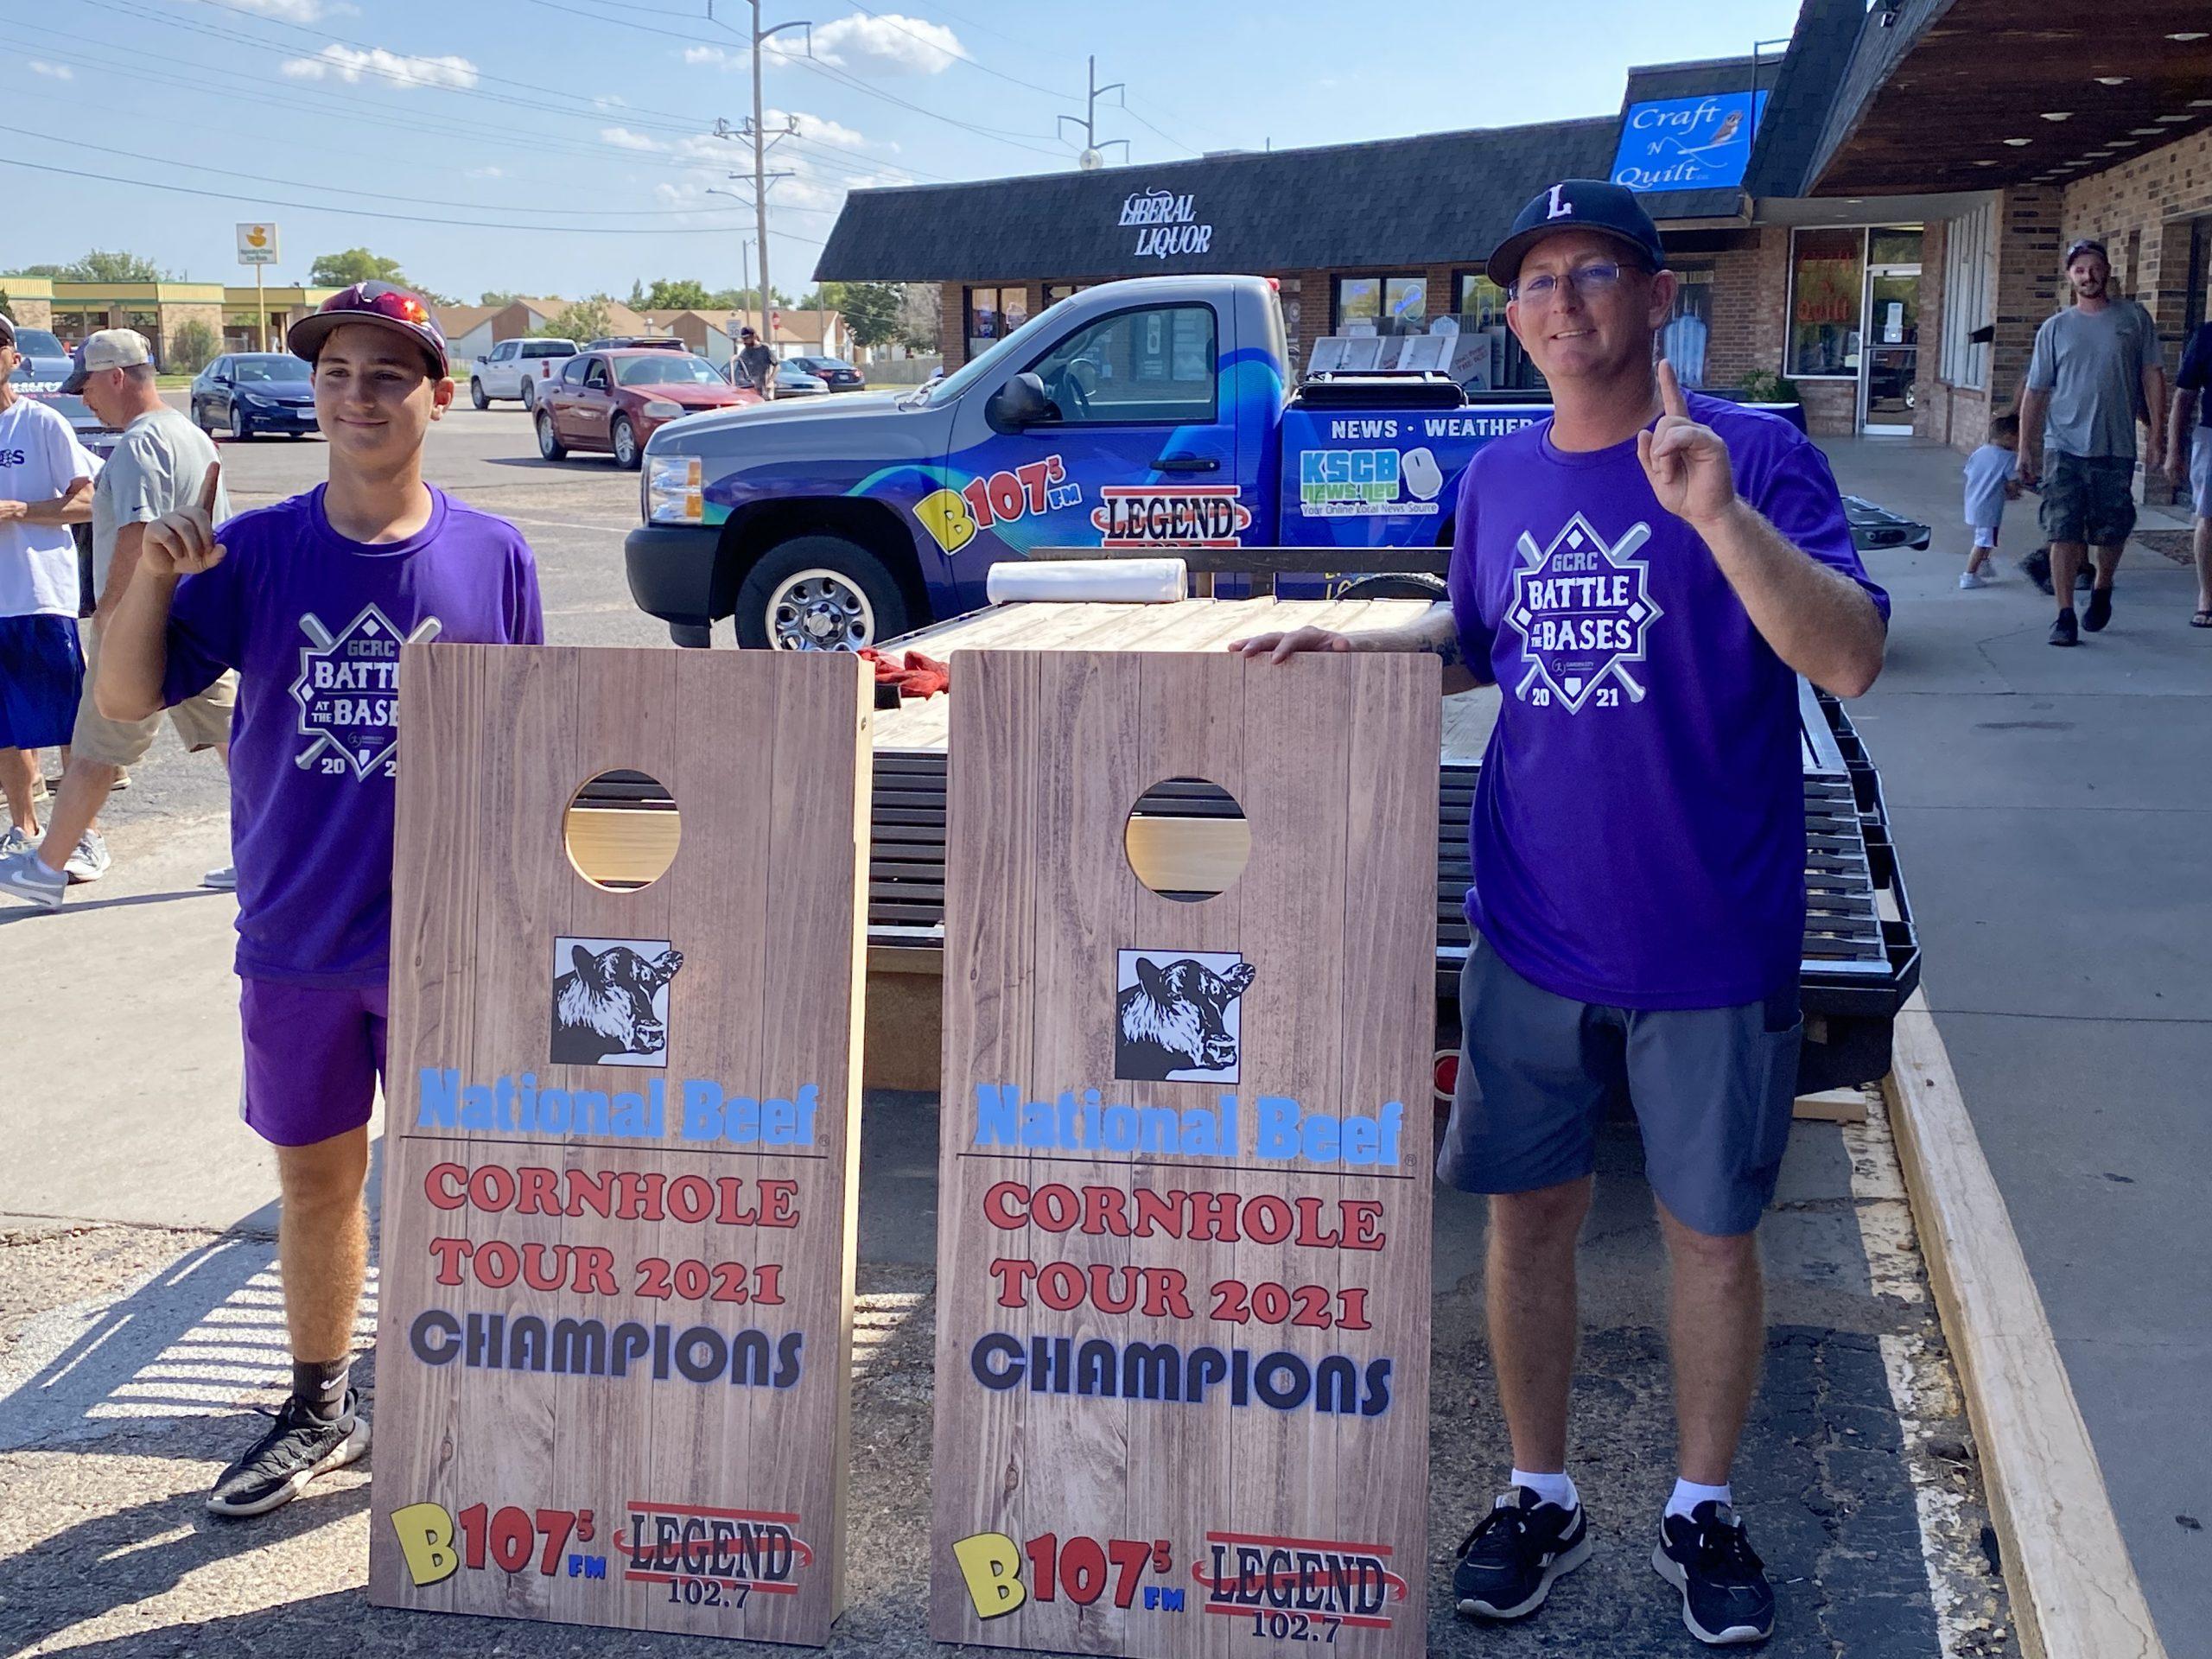 Hubcaps Win National Beef Cornhole Tournament